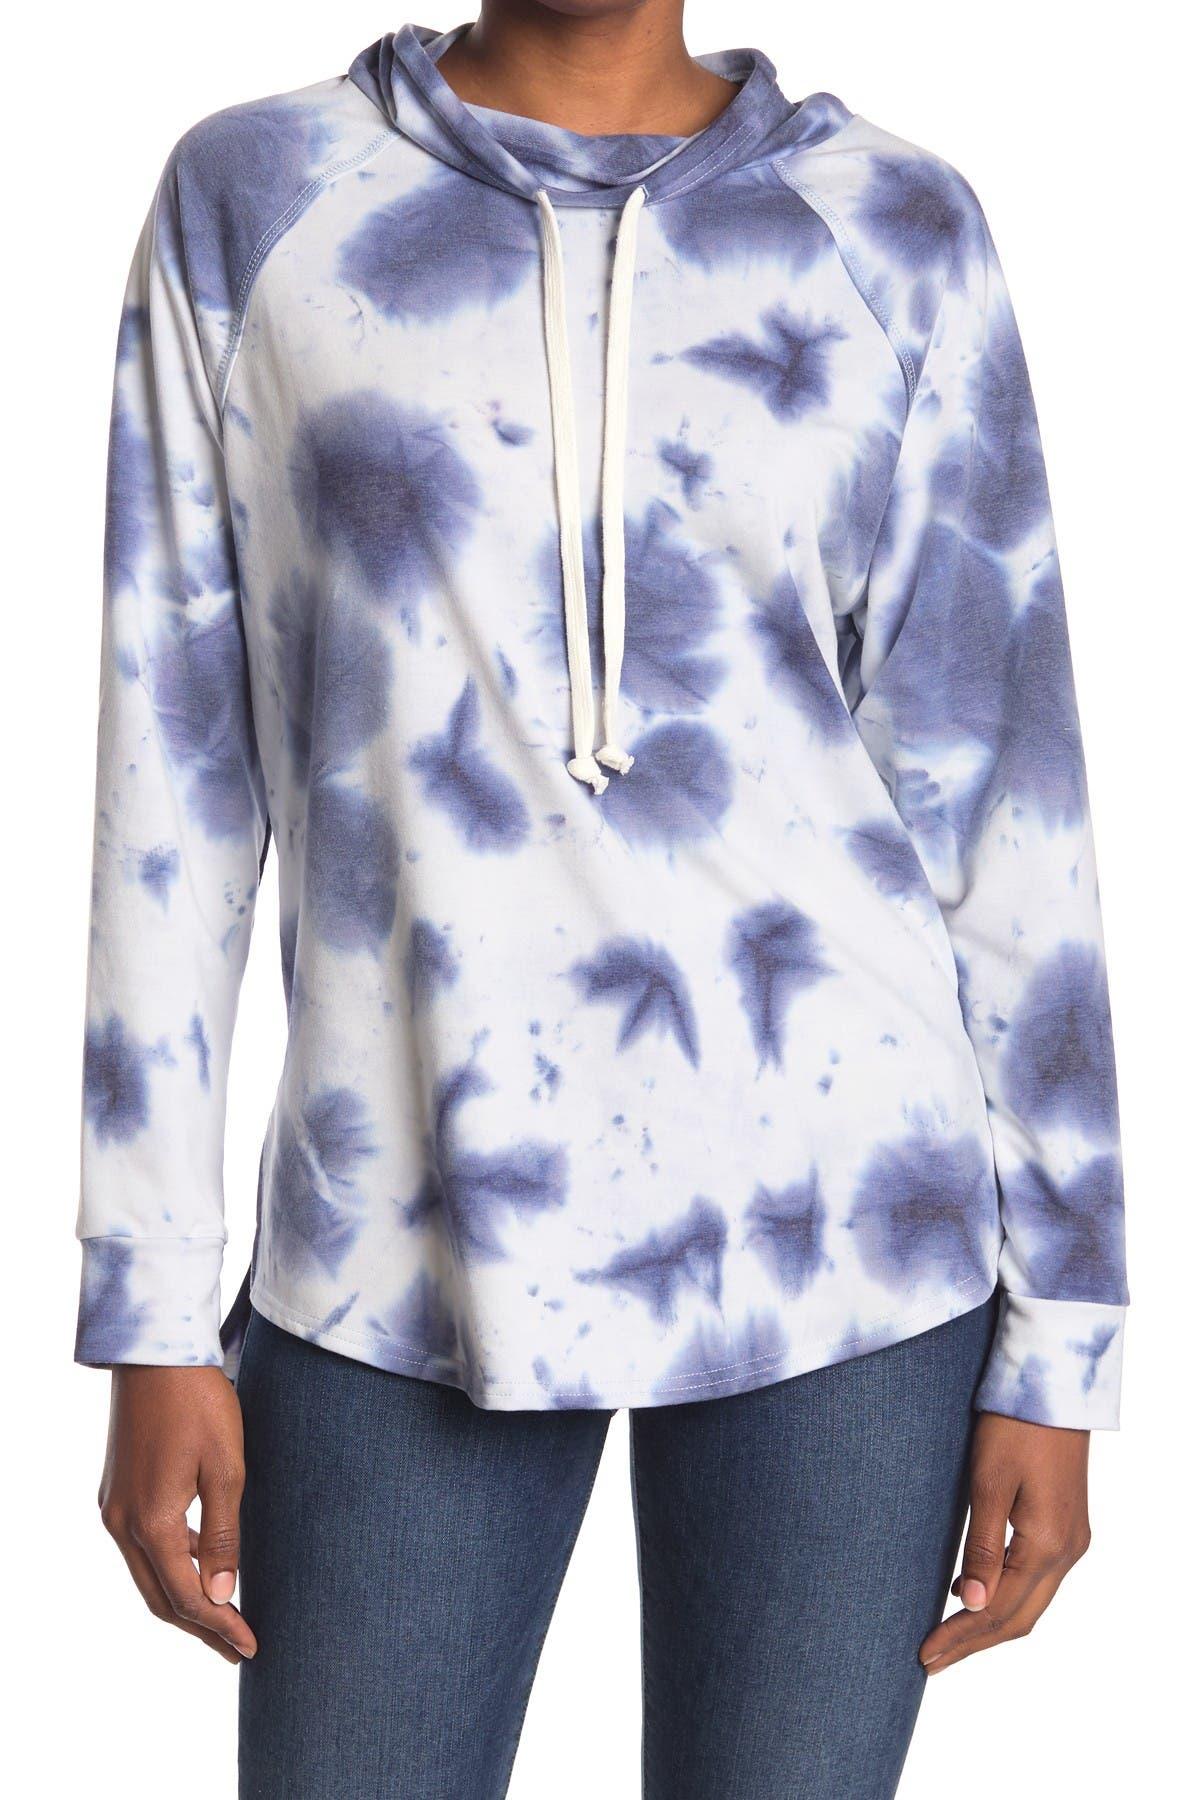 hymyyxgs Womens Fashion Long Sleeve Knit Hoodie Striped Color Block Drawstring Hood Sweatshirt Top Blouse